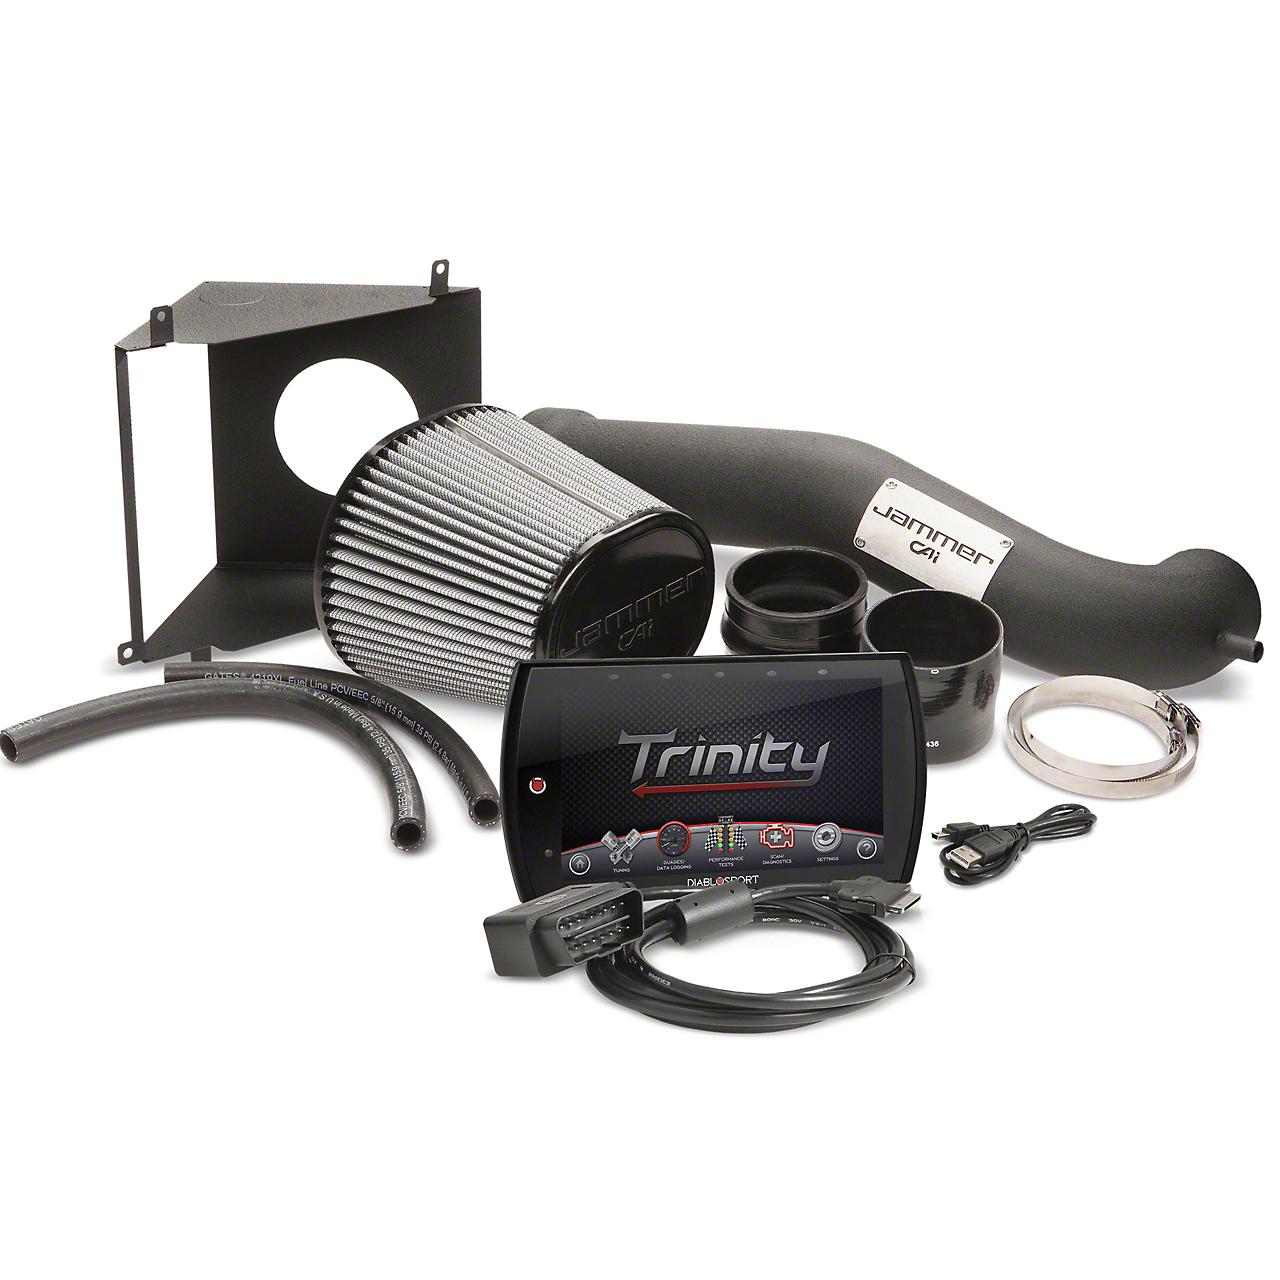 Diablosport Reaper Jammer Cold Air Intake & Trinity 2 Tuner Combo Kit - Stage 1 (09-13 6.2L Sierra 1500)